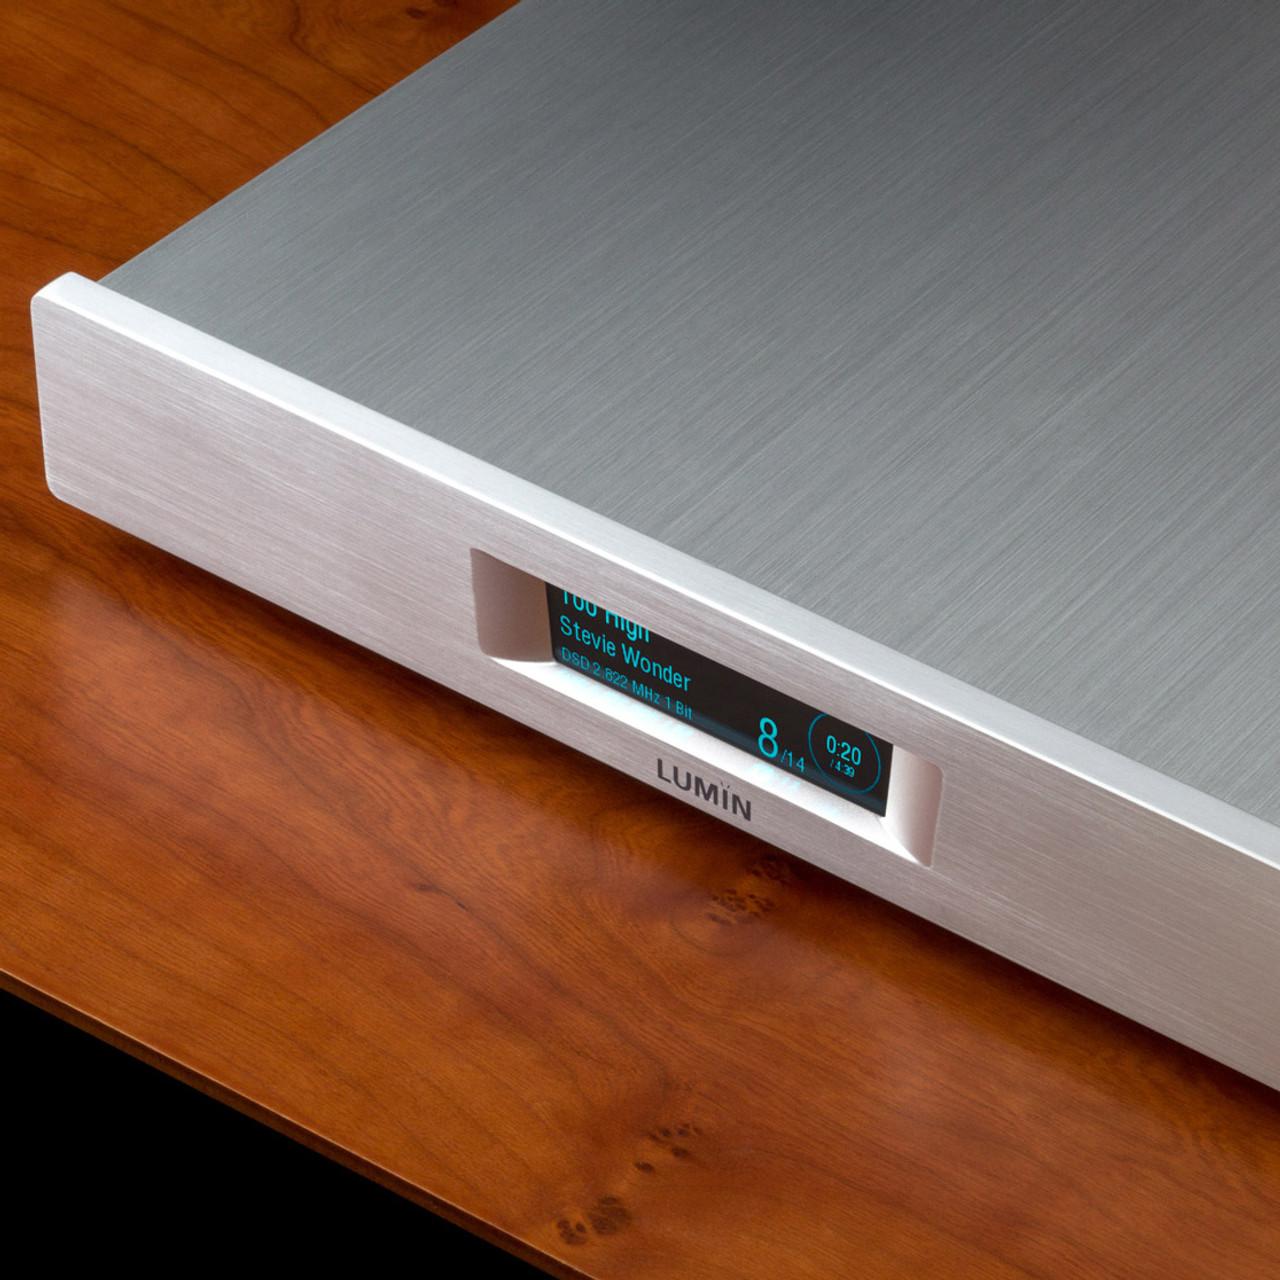 Lumin T1 network music streamer